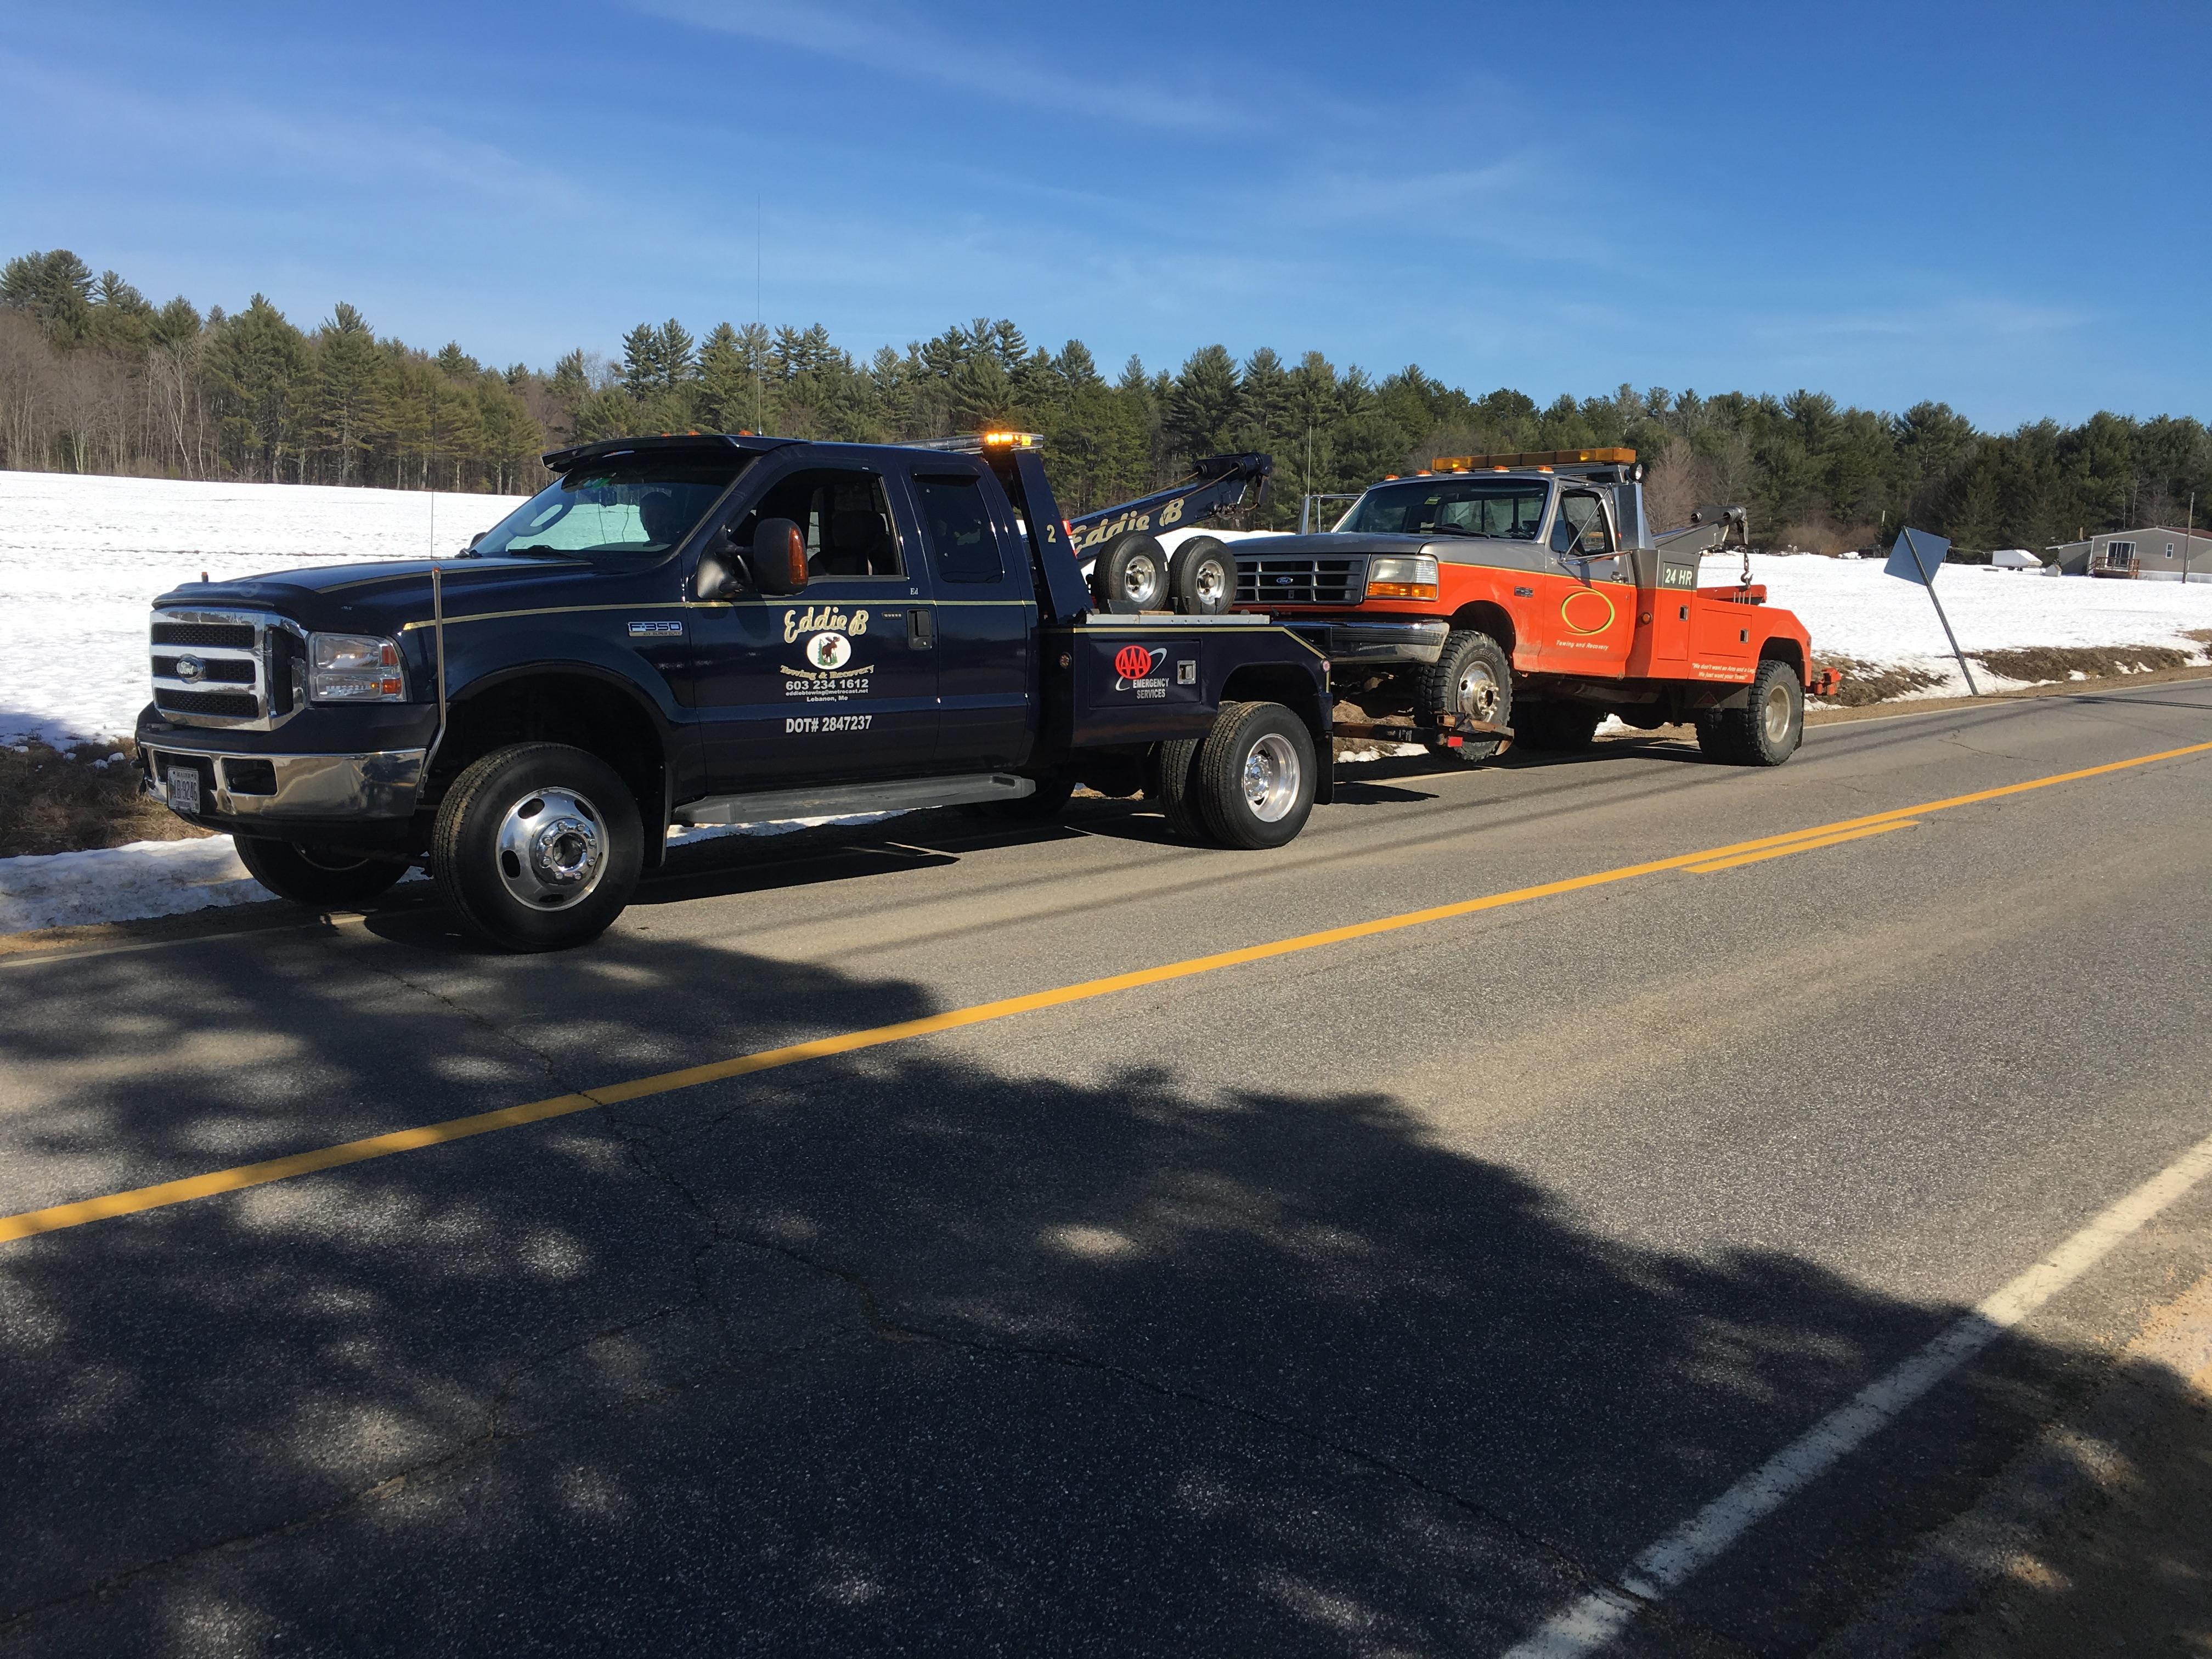 Tire Repair Near Me Open Sunday >> Eddie B Towing & Recovery, Lebanon Maine (ME) - LocalDatabase.com